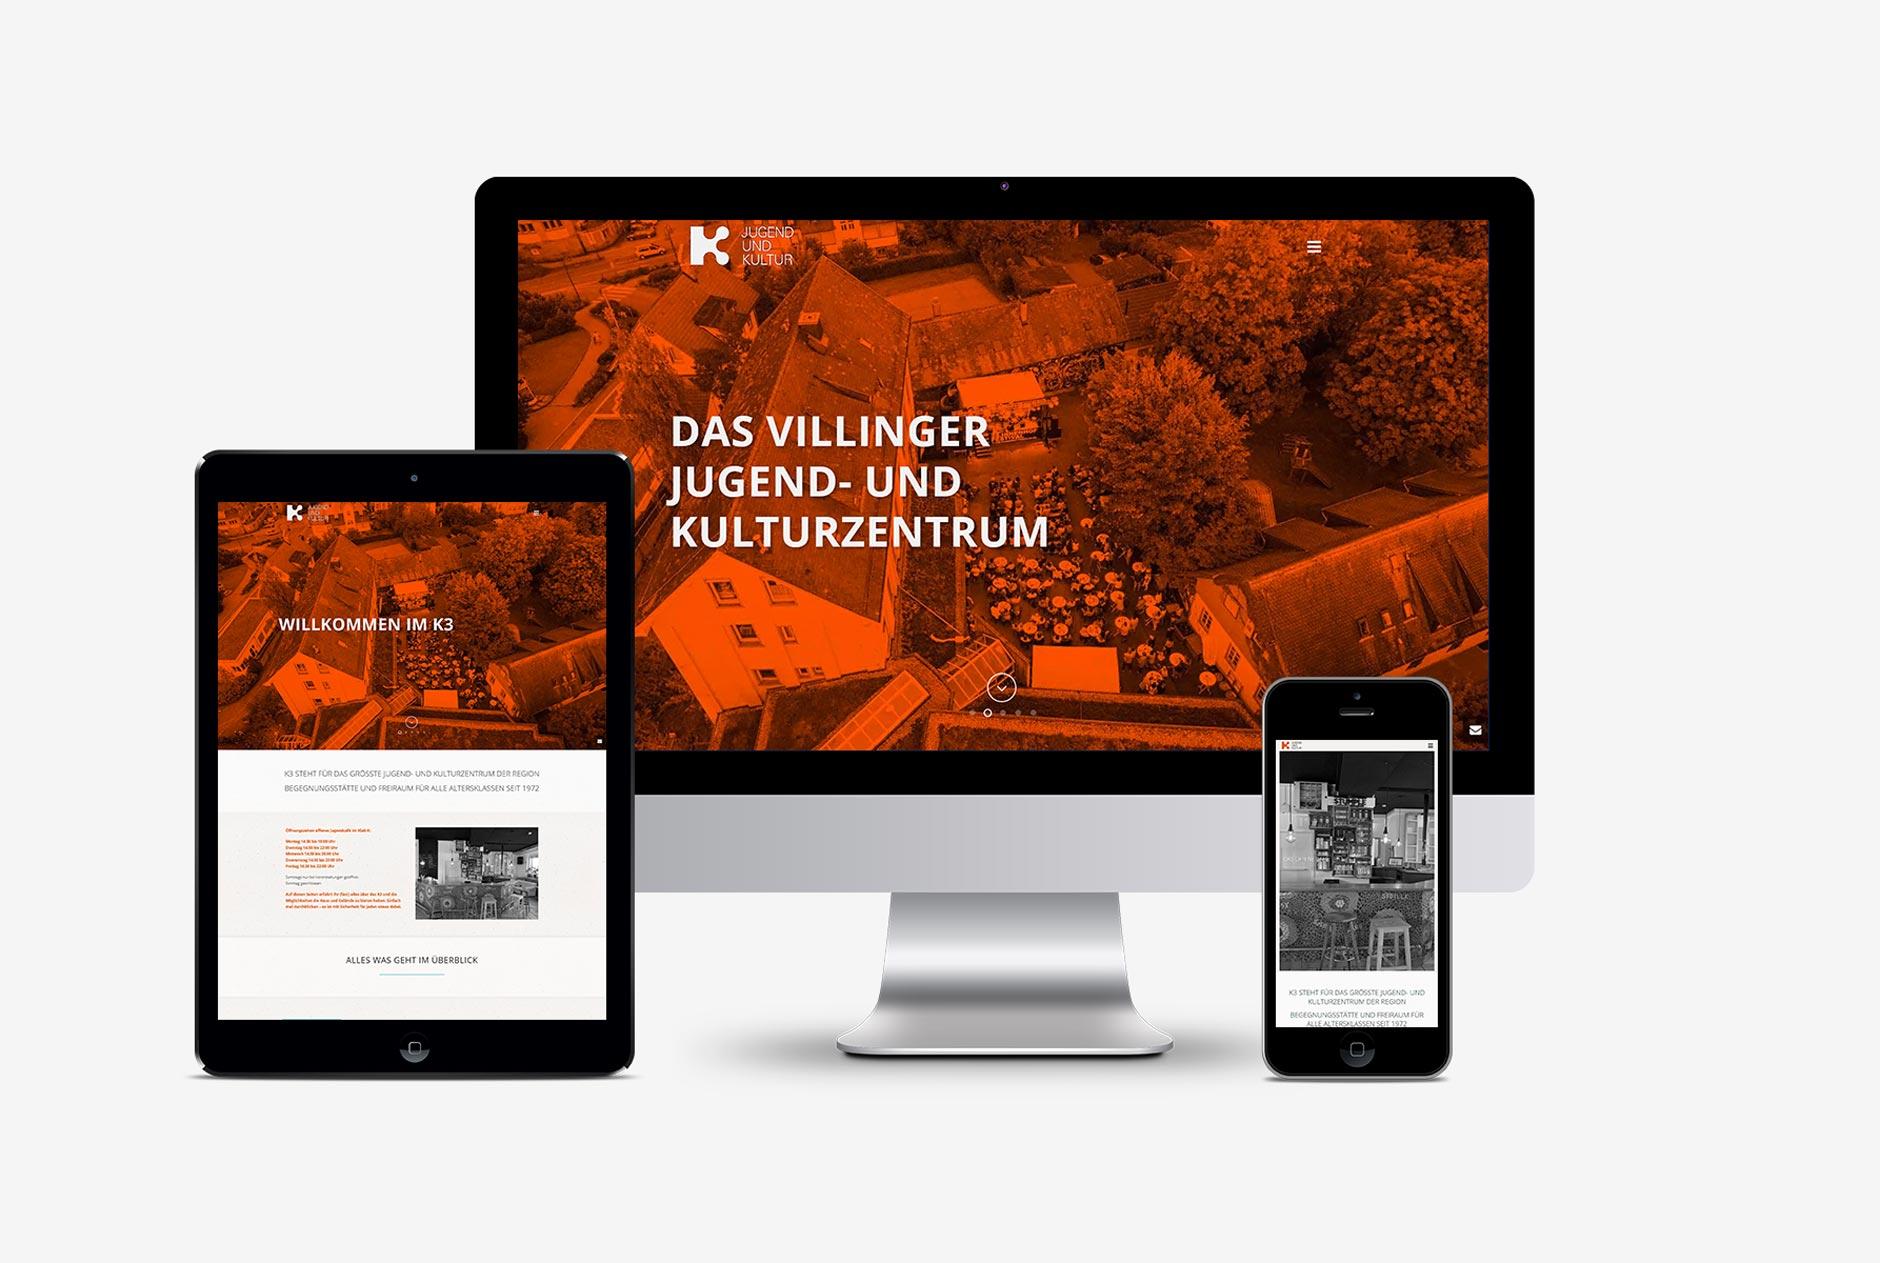 K3 jugend und kulturzentrum villingen schwenningen webdesign-Webdesign K3 Villingen-Schwenningen